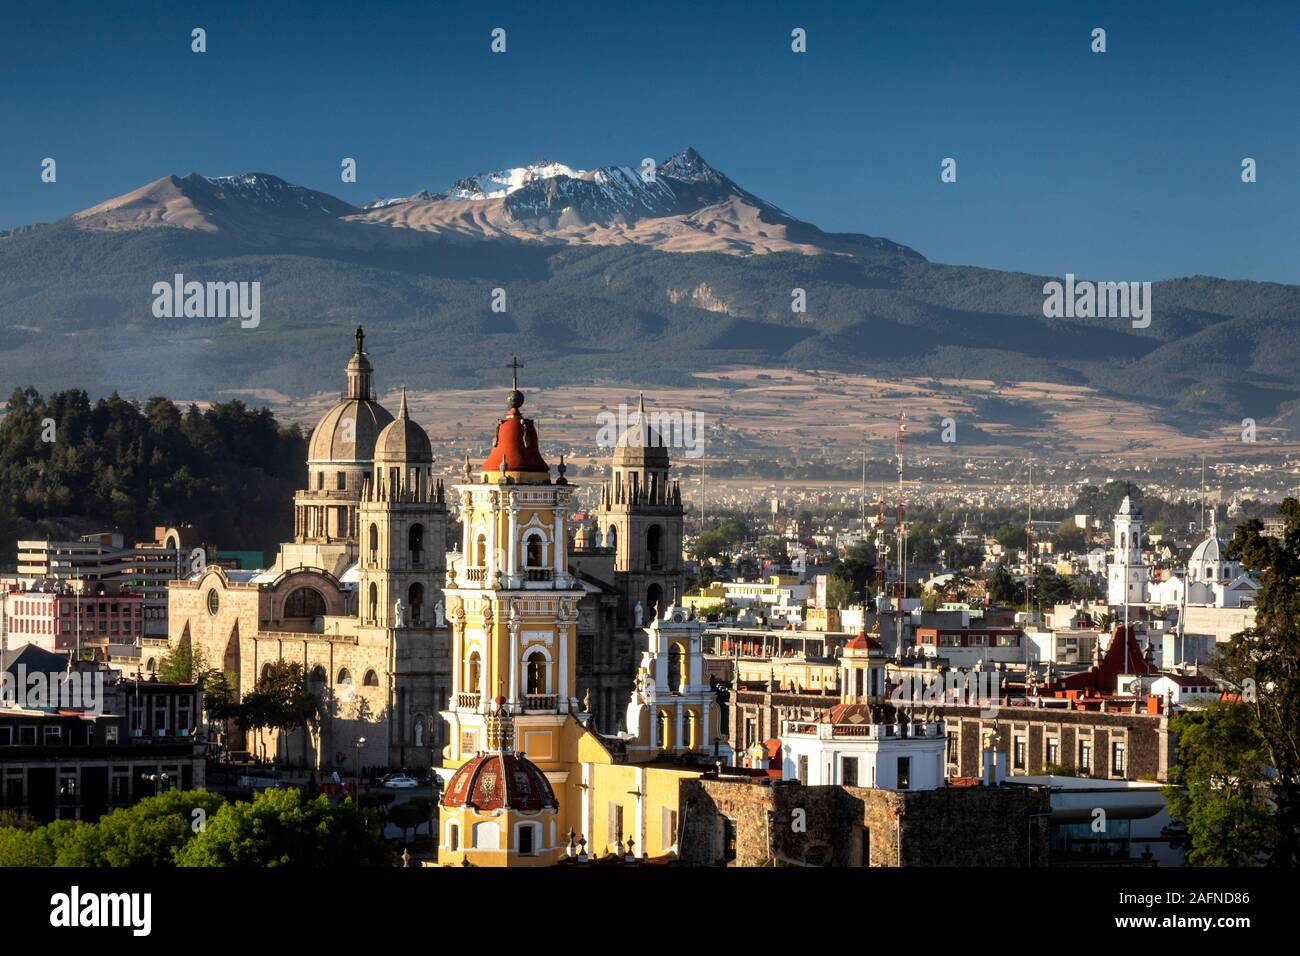 The Nevado de Toluca mountain rises up above the historic downtown of Toluca, Mexico. Stock Photo